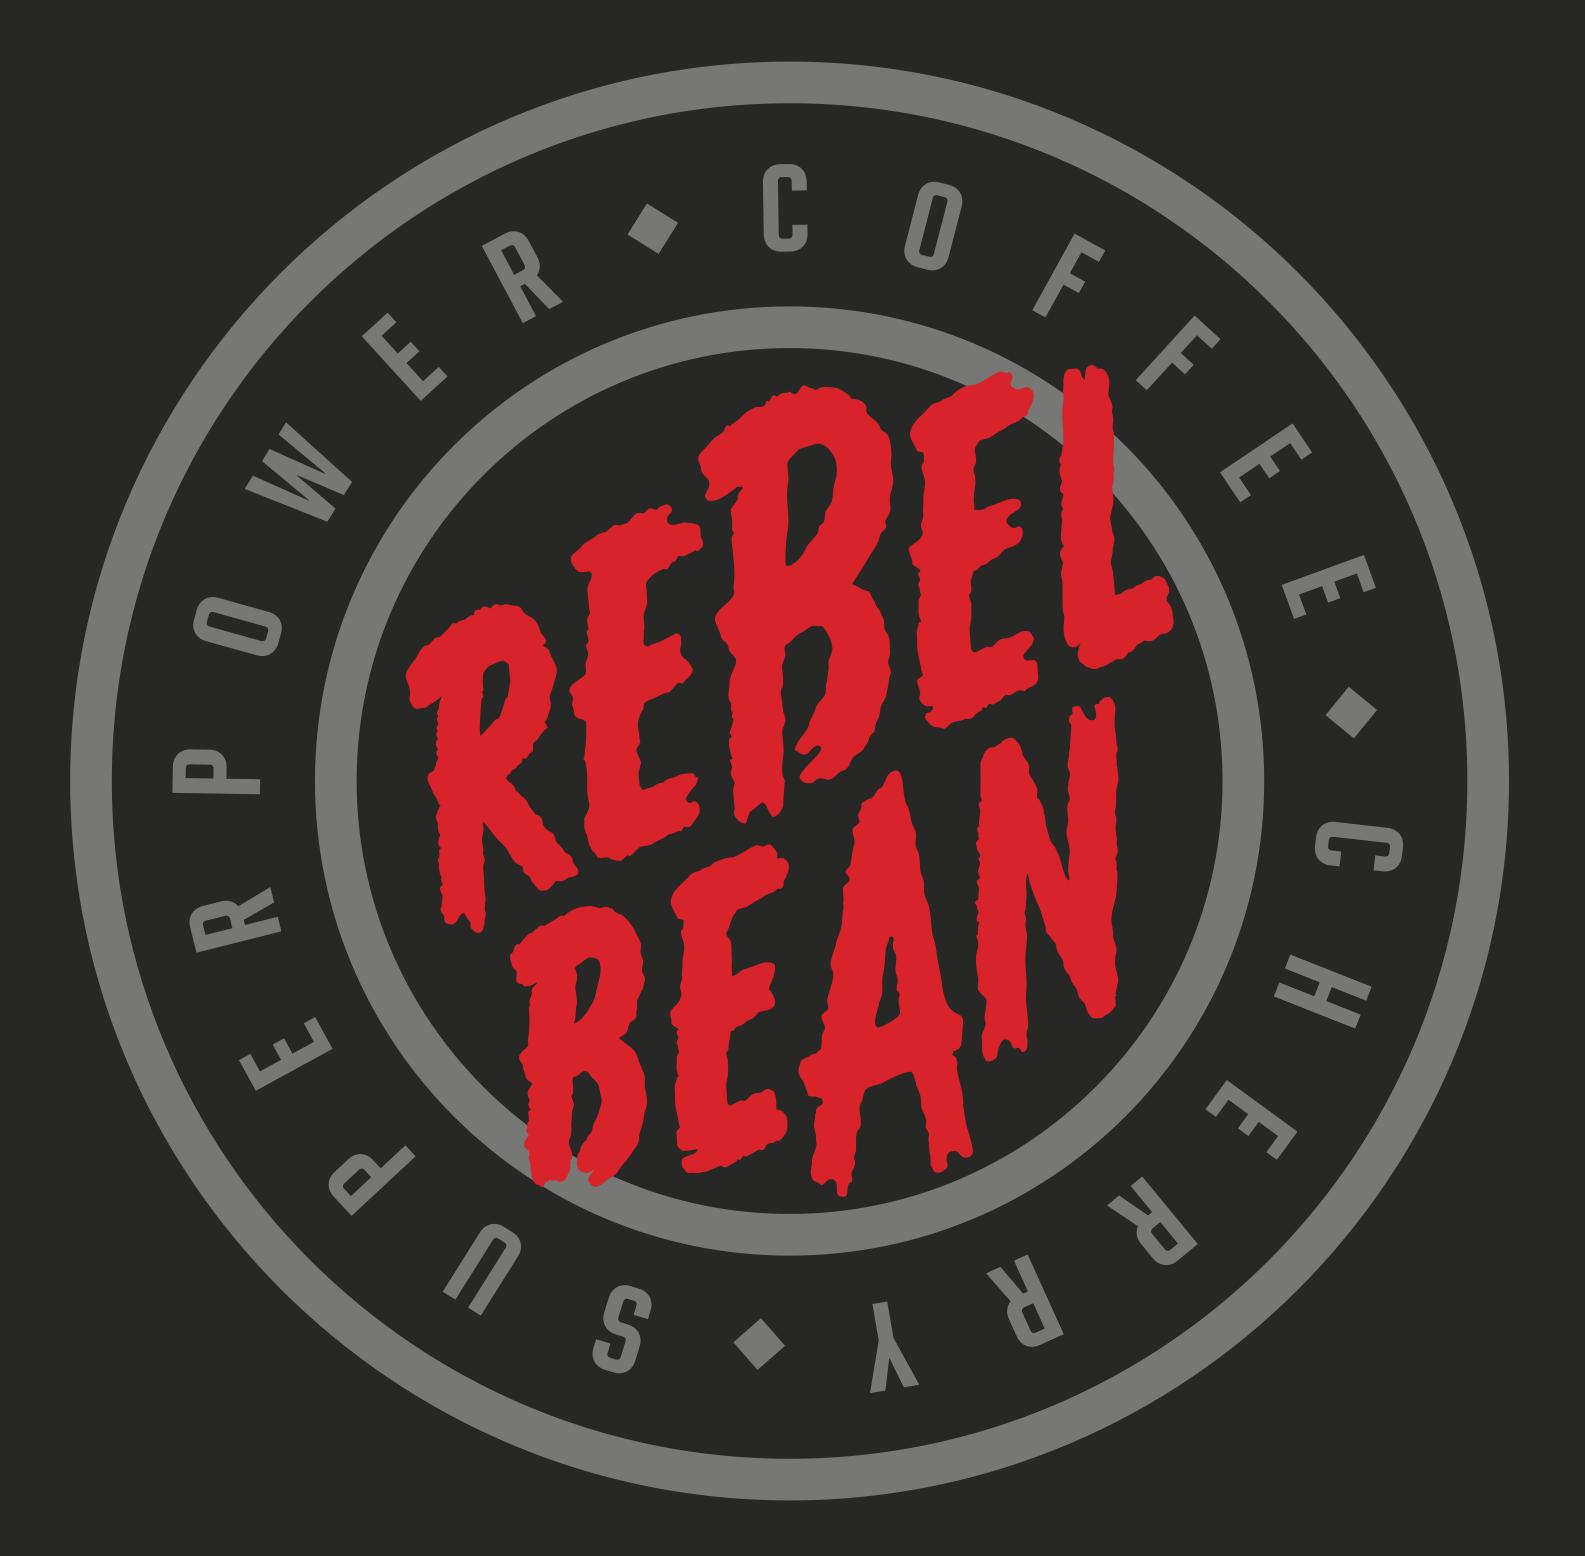 Rebel beans